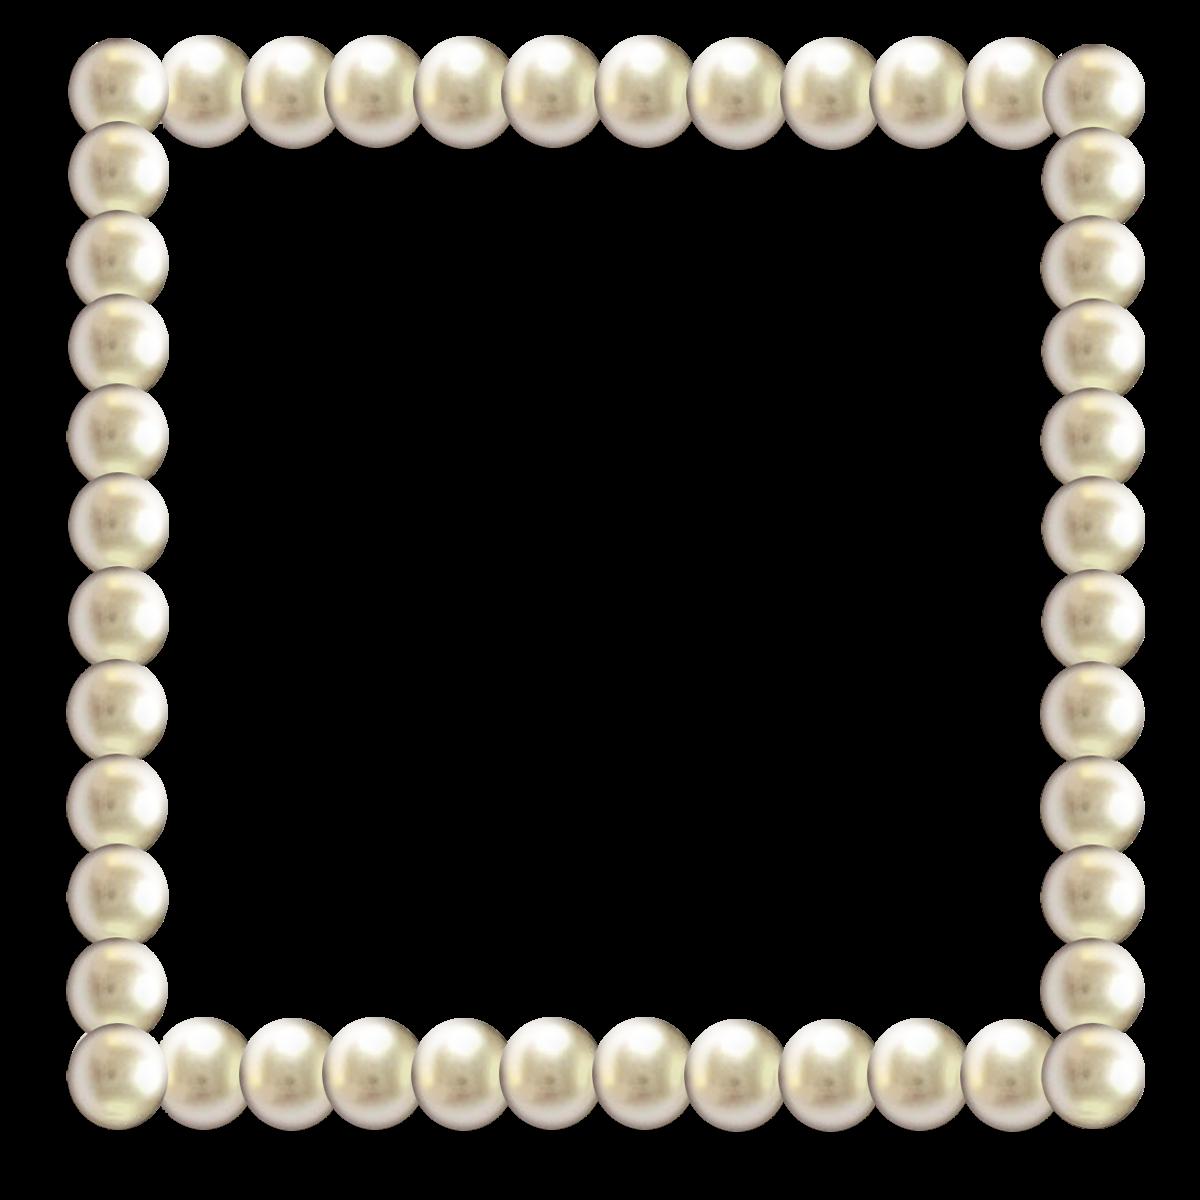 Frames table pictures transparentpng. Pearl border png